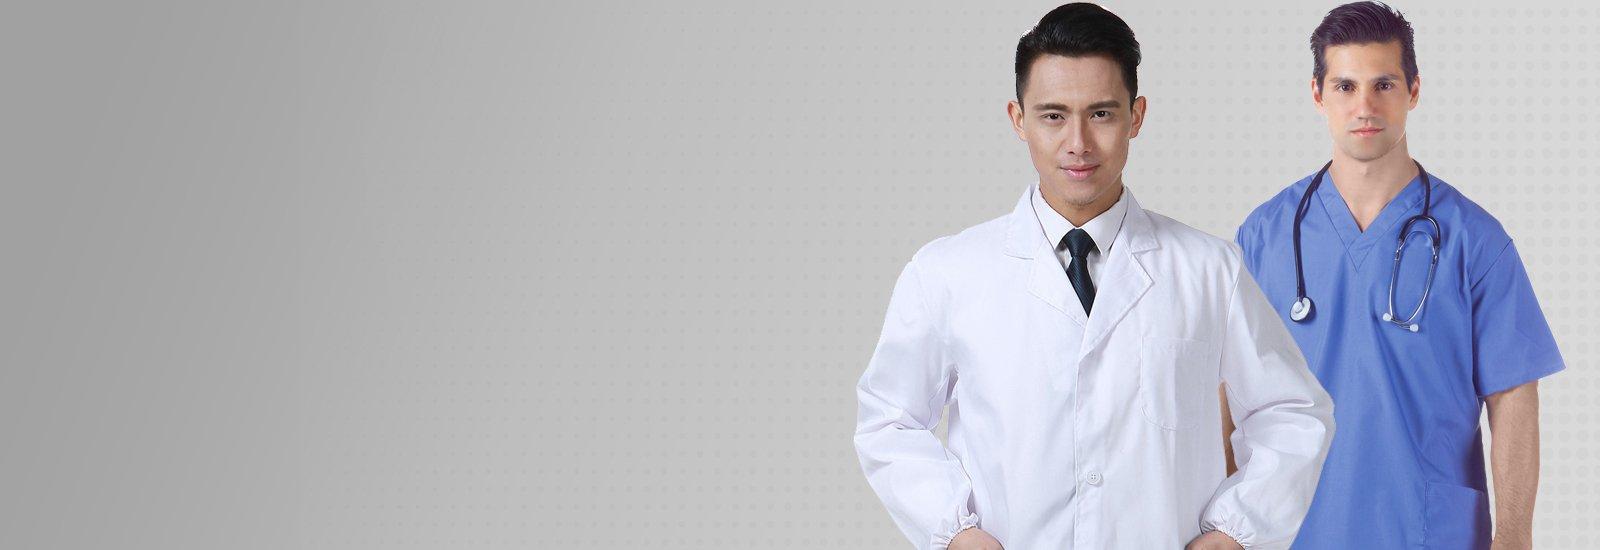 hospital uniforms